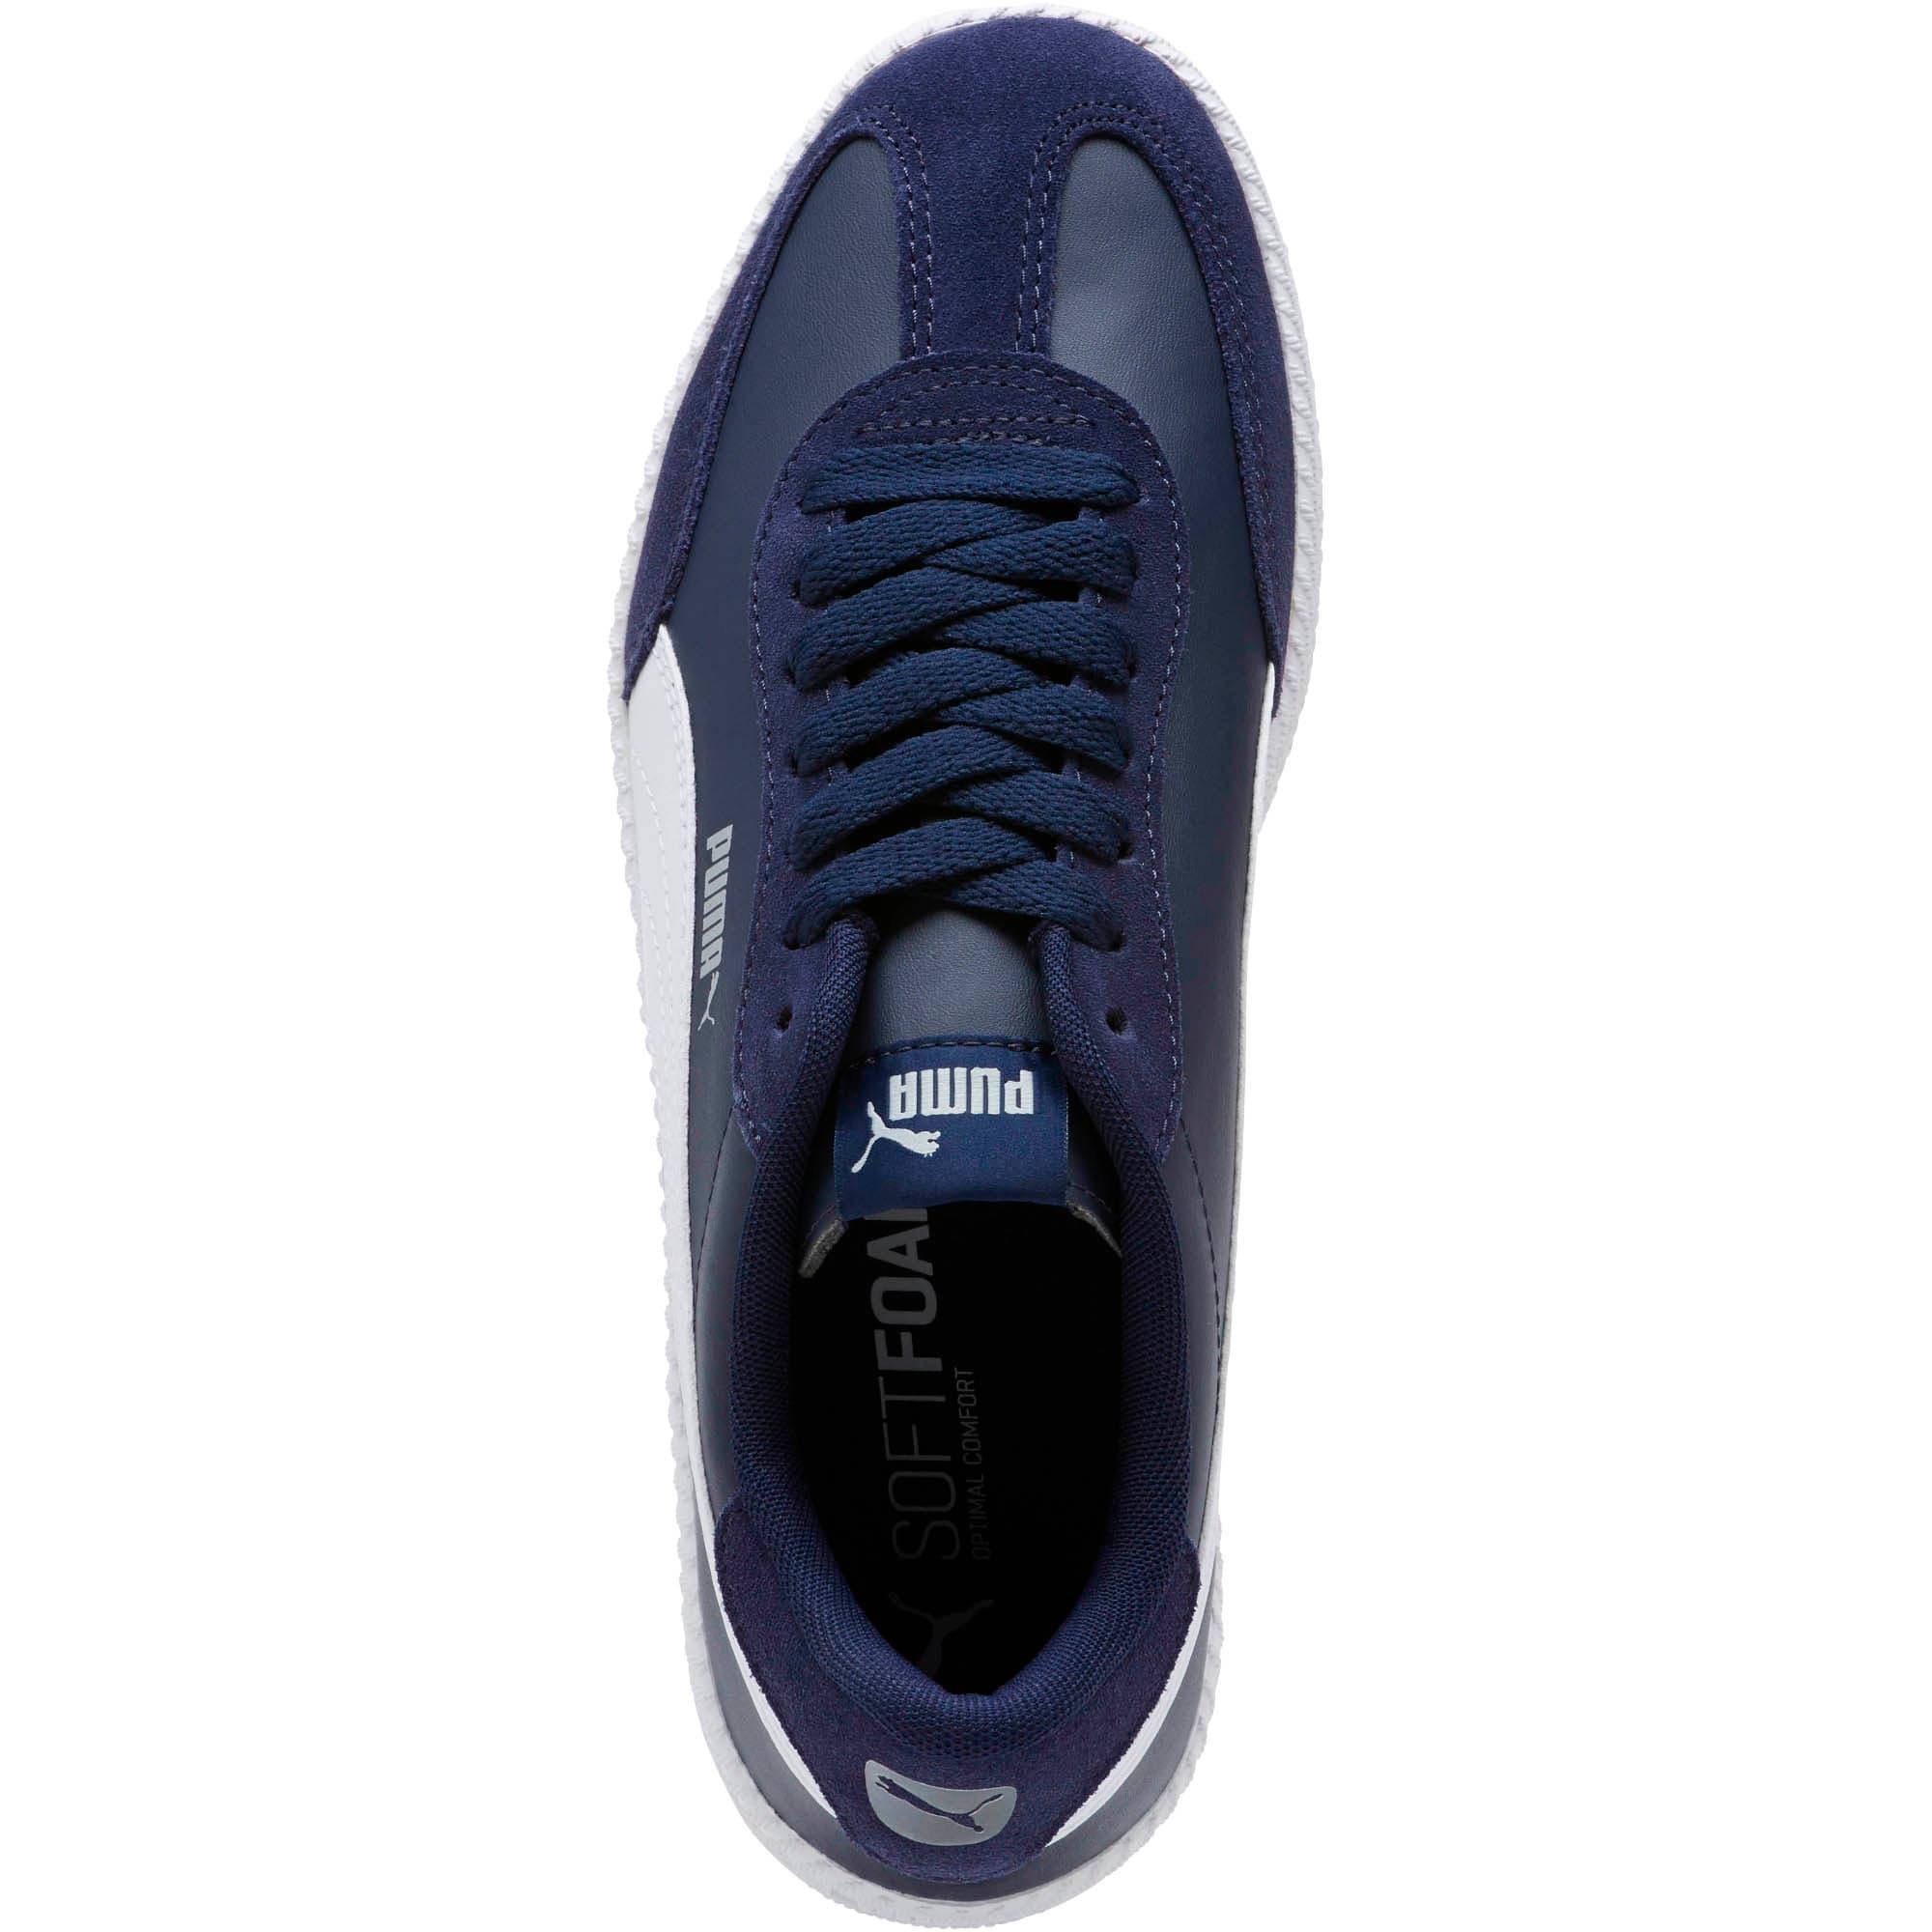 Thumbnail 5 of Astro Cup Sneakers, Peacoat-Puma White, medium